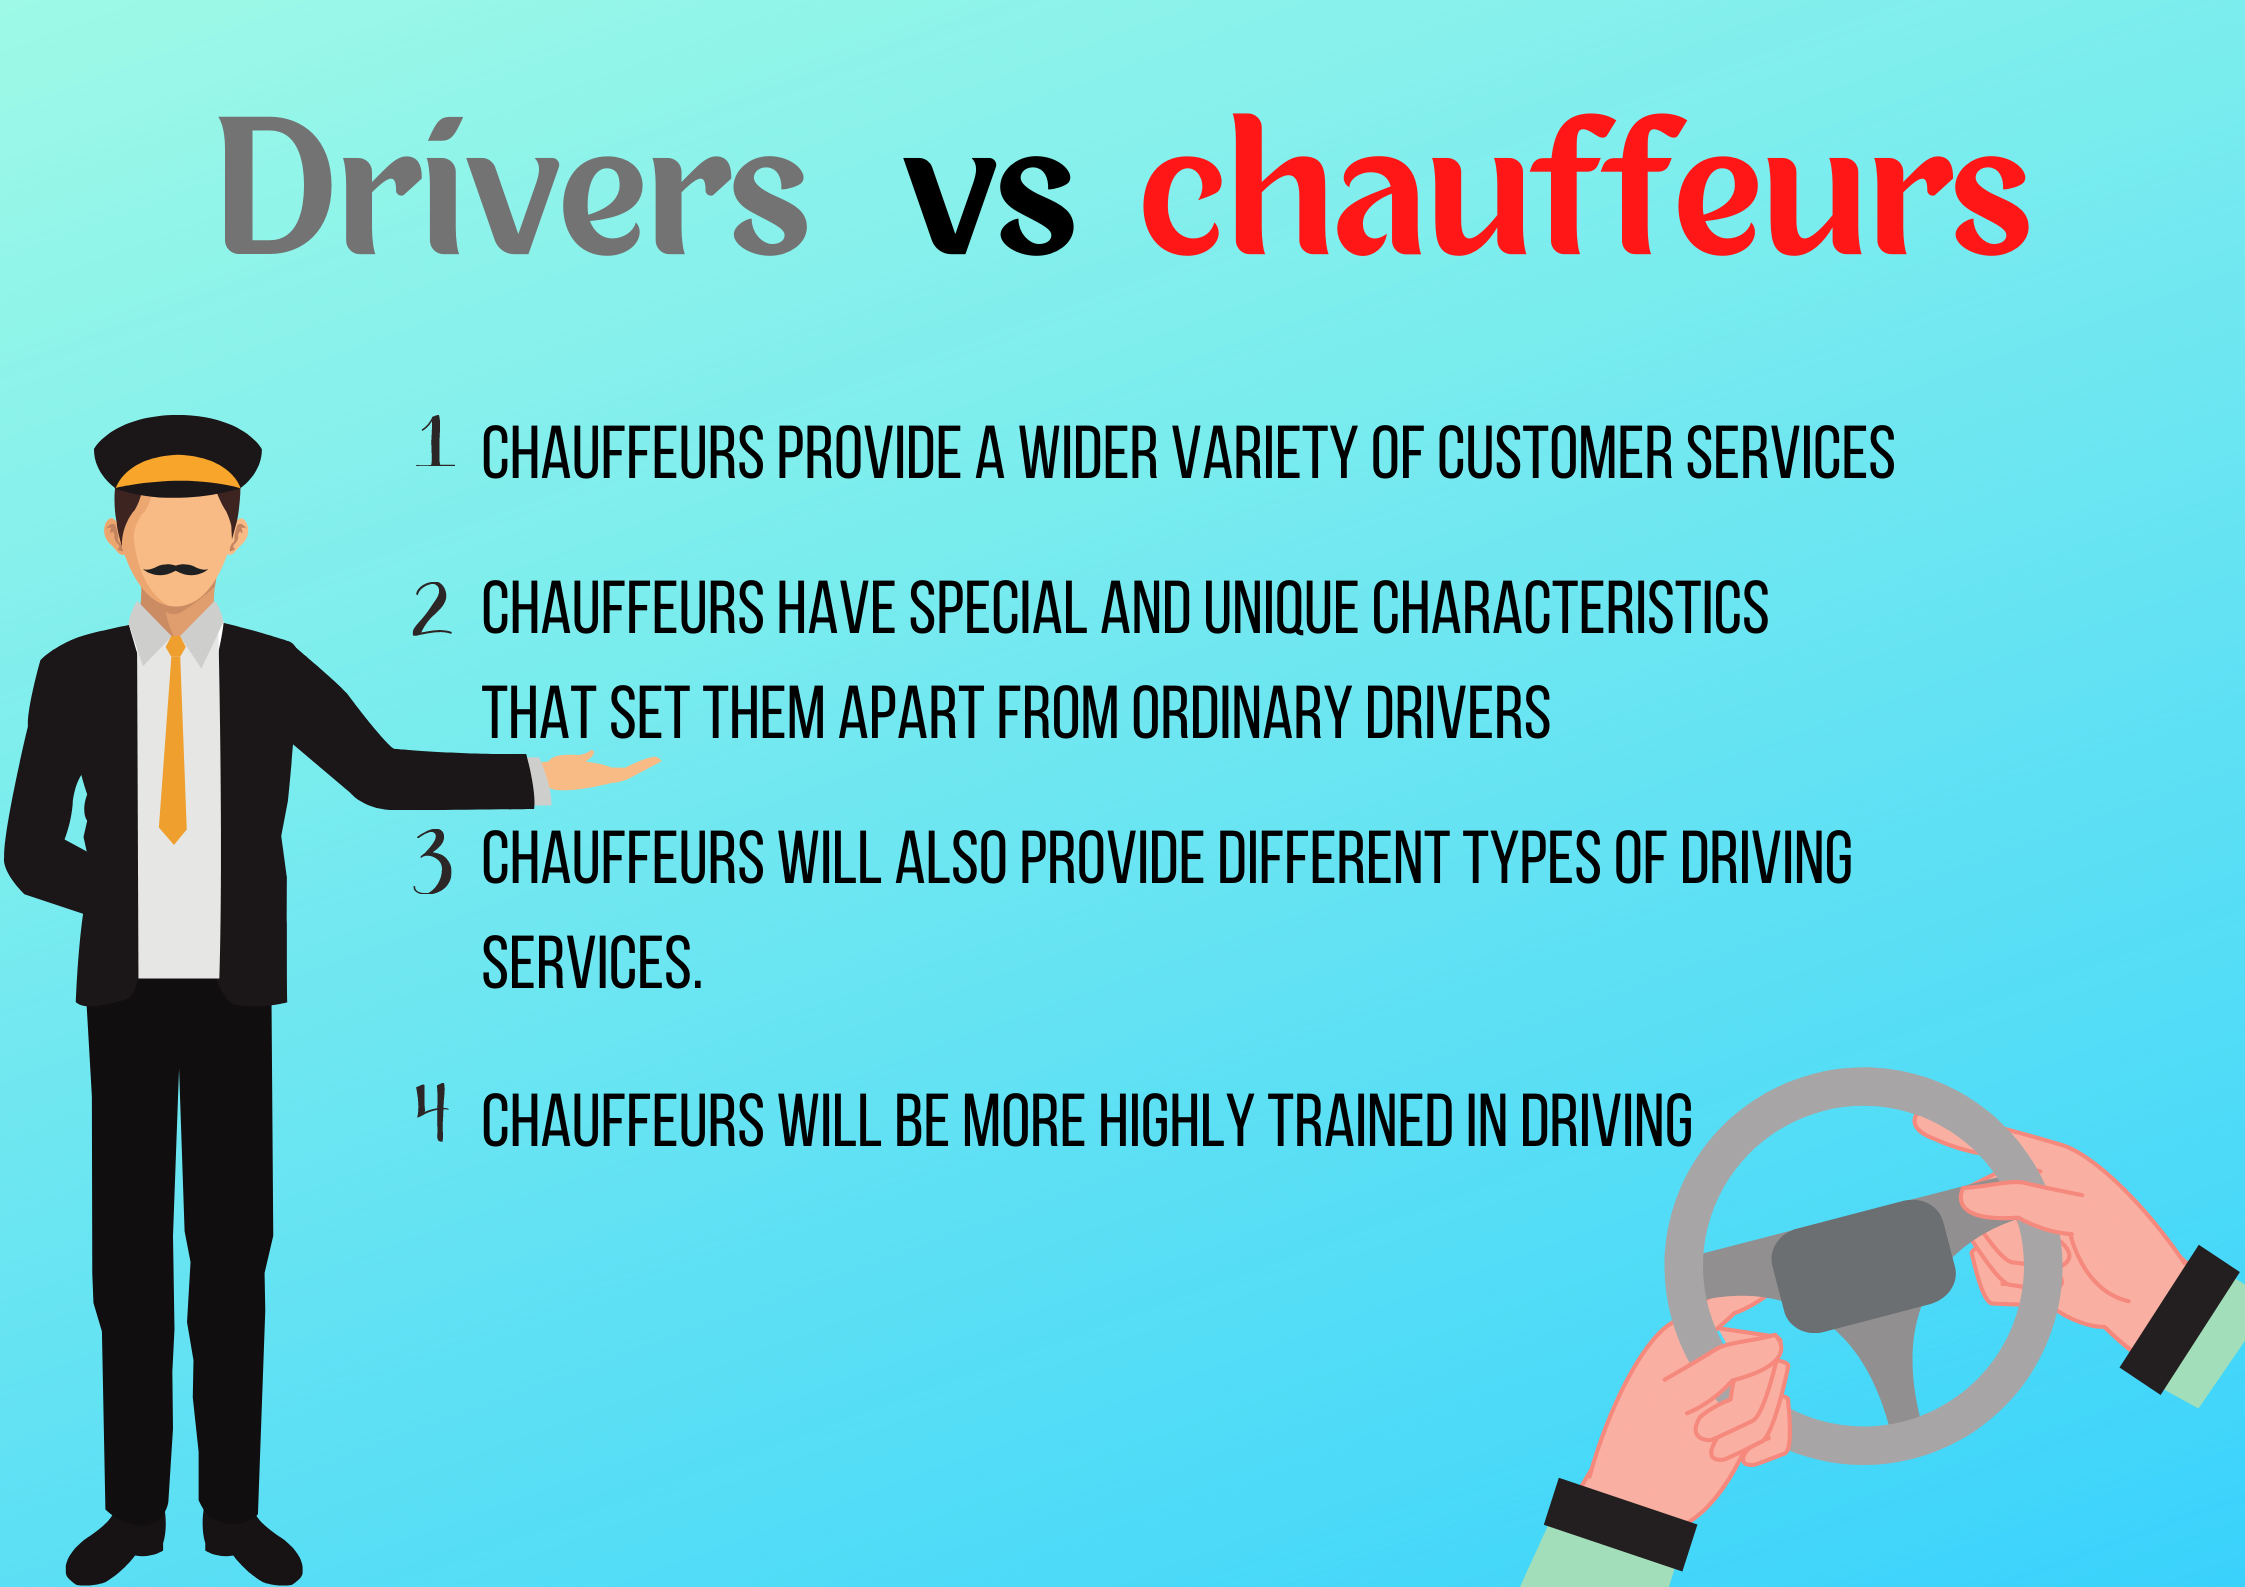 Drivers-vs-chauffeurs